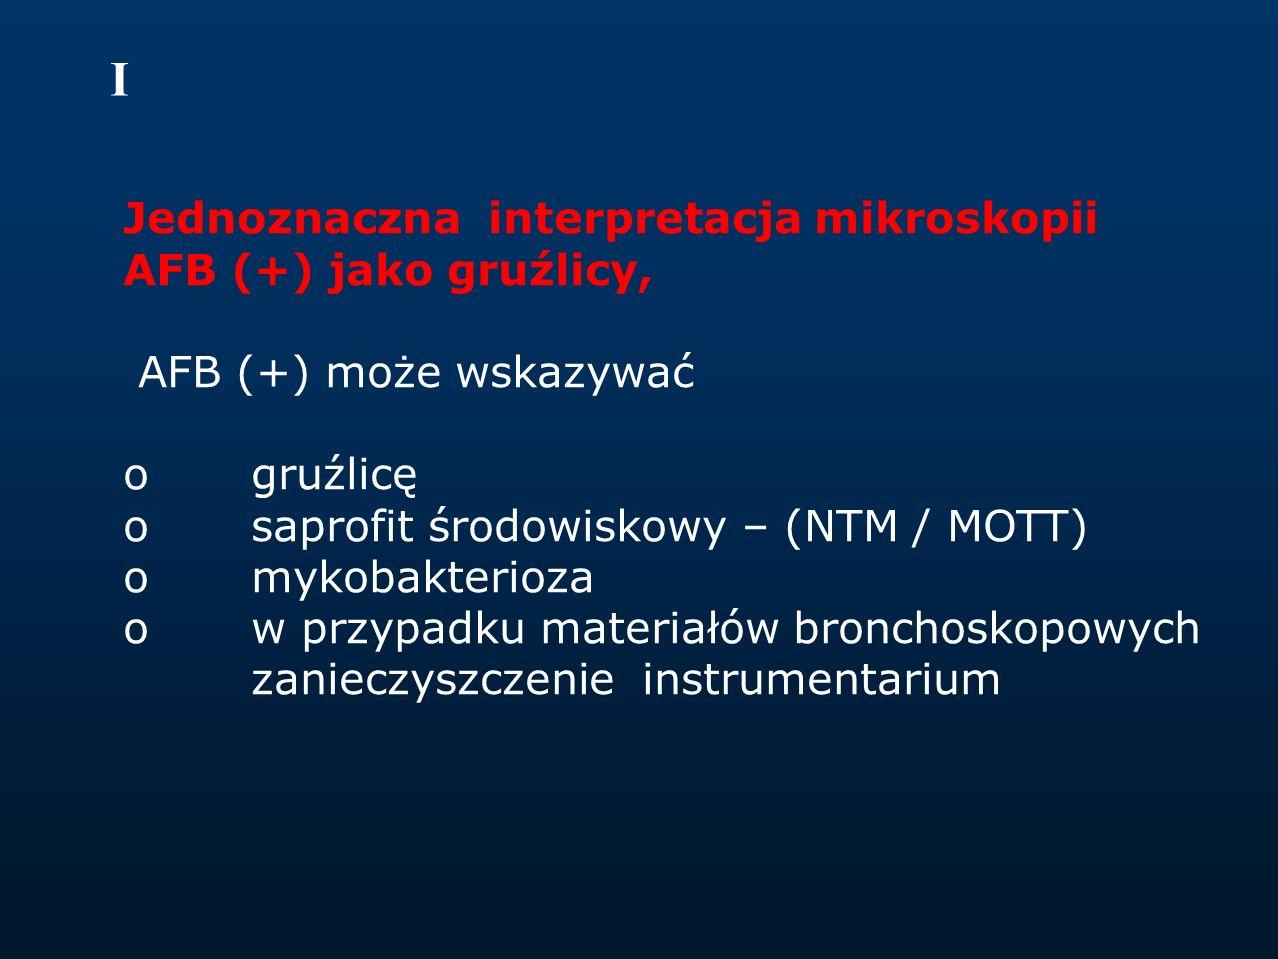 I Jednoznaczna interpretacja mikroskopii AFB (+) jako gruźlicy,